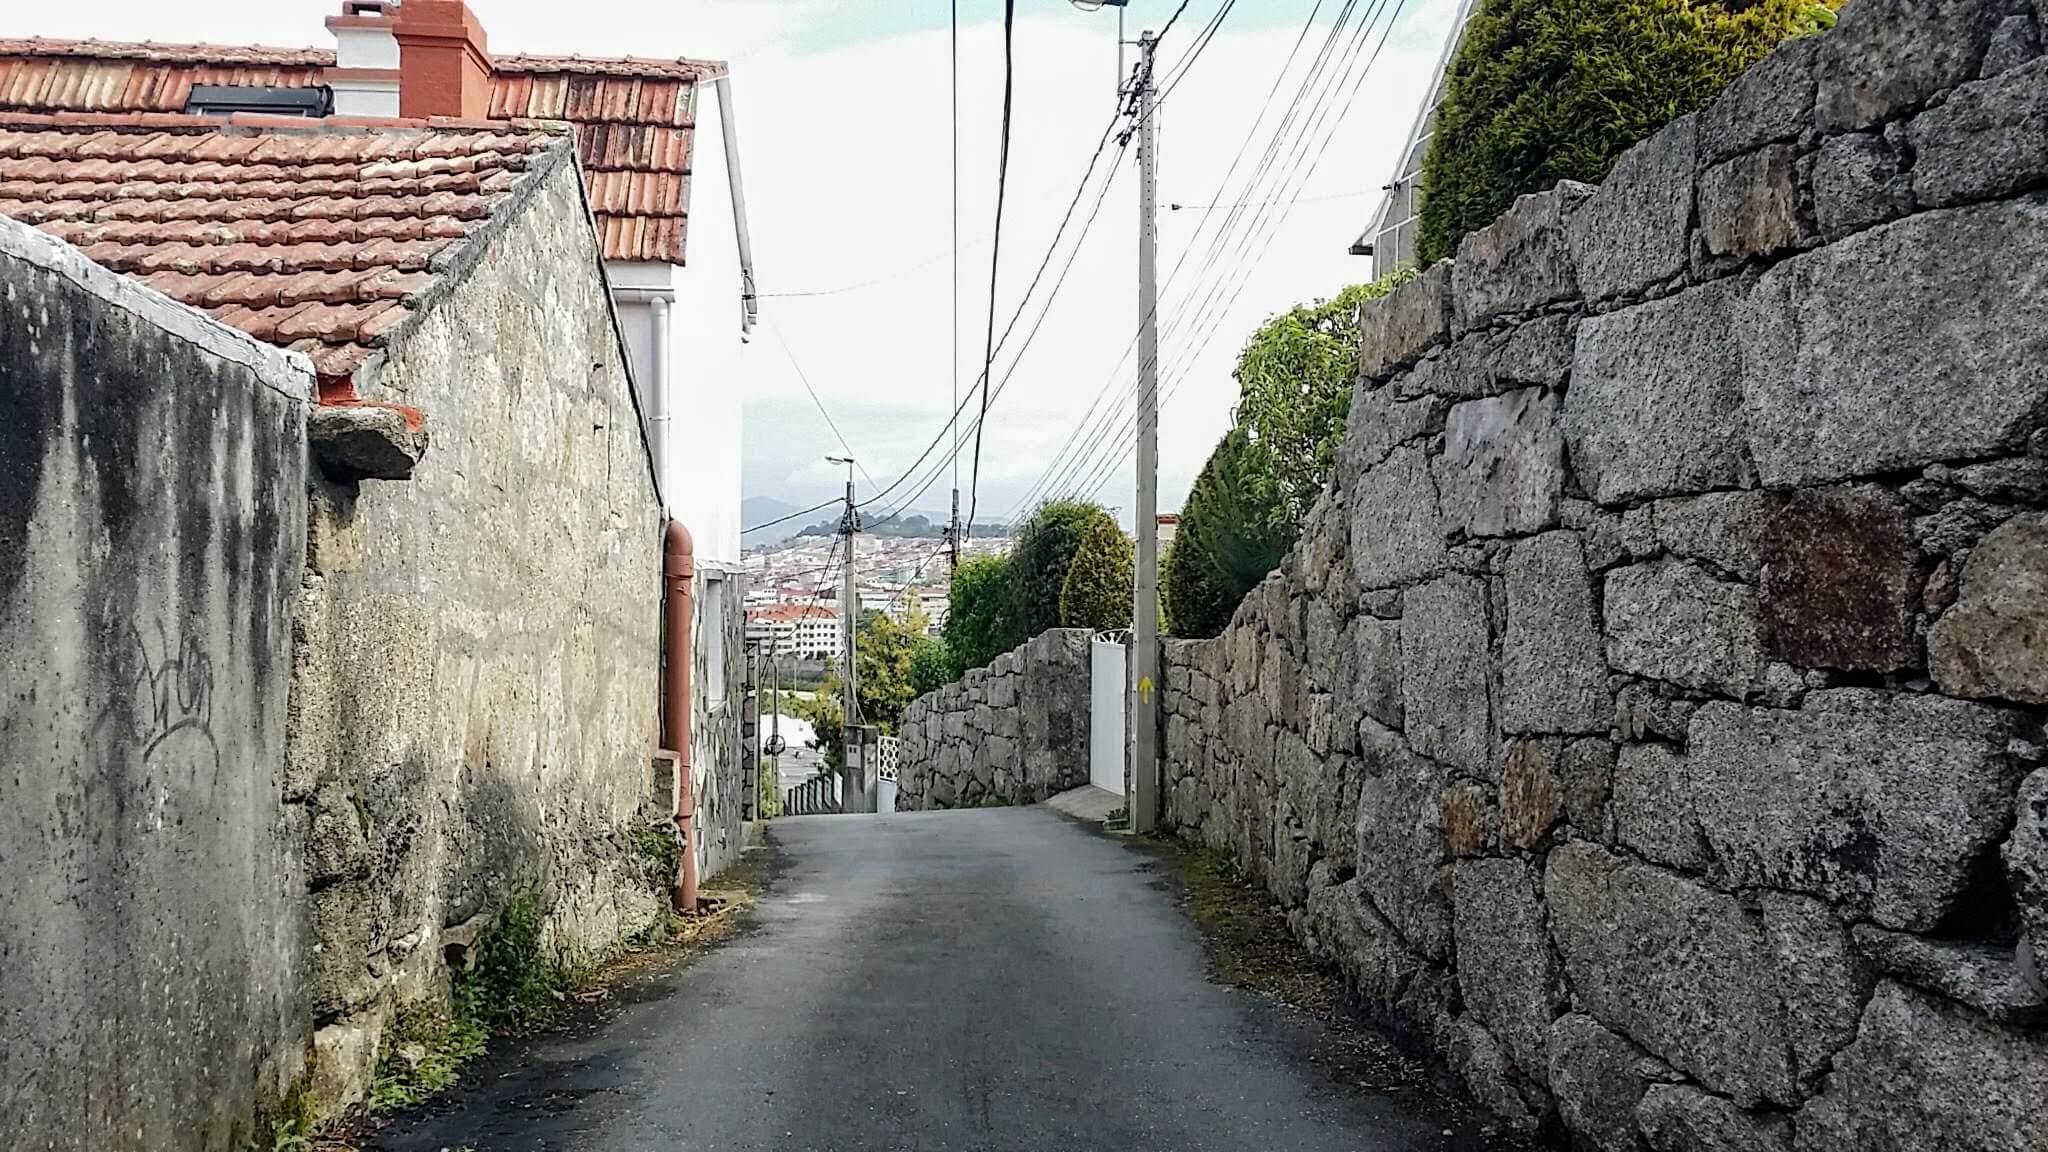 Down the Hill on the Rúa do Roupeiro in Vigo, Spain on day twenty-one of Portuguese Way